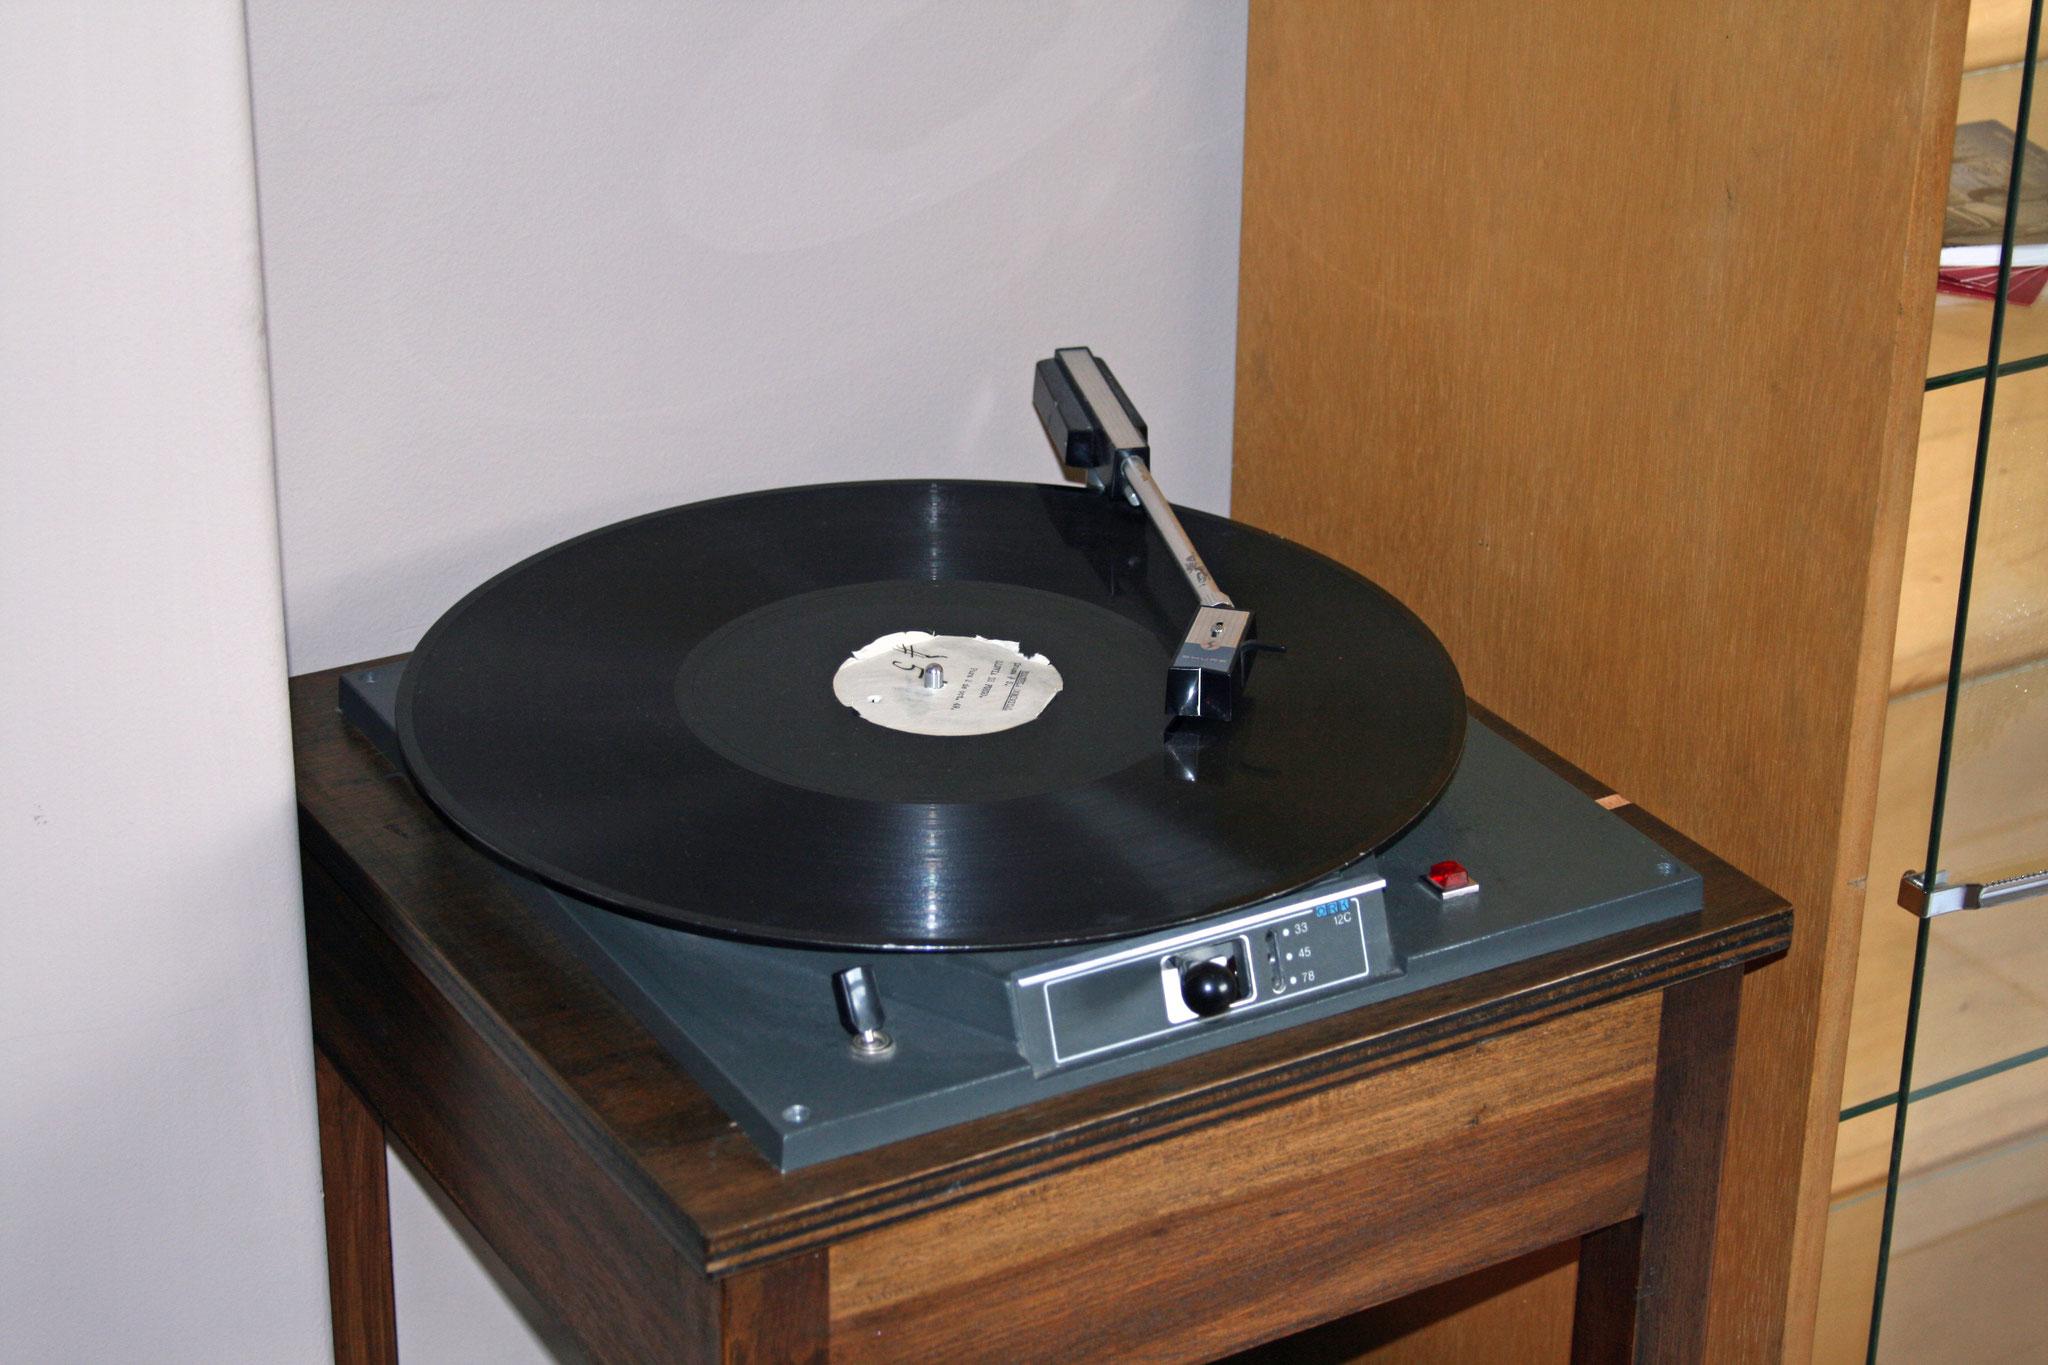 Spezieller Plattenspieler für US-Studios mit ca. 35-er LP-Umfang